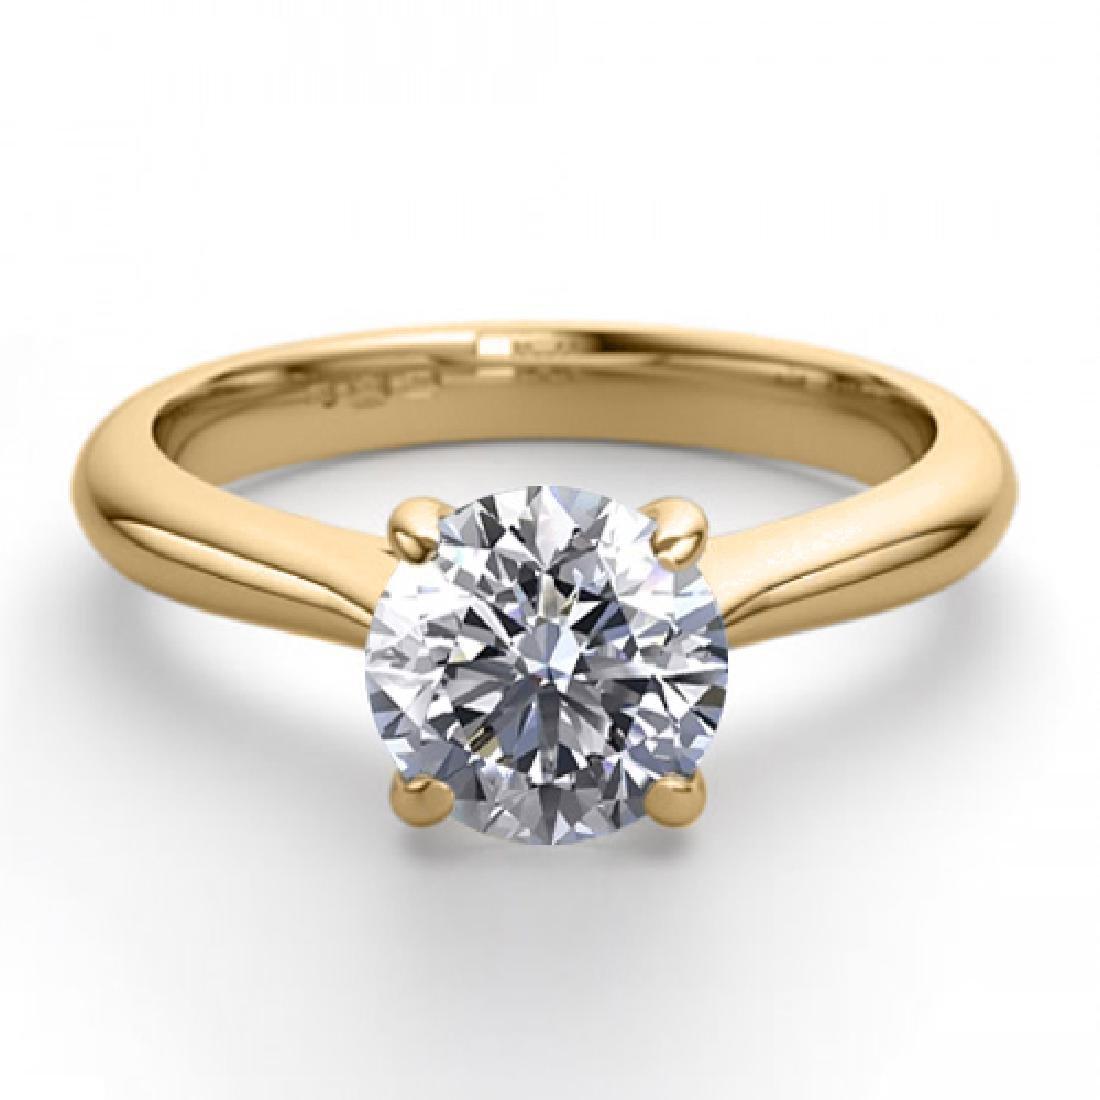 18K Yellow Gold Jewelry 1.41 ctw Natural Diamond